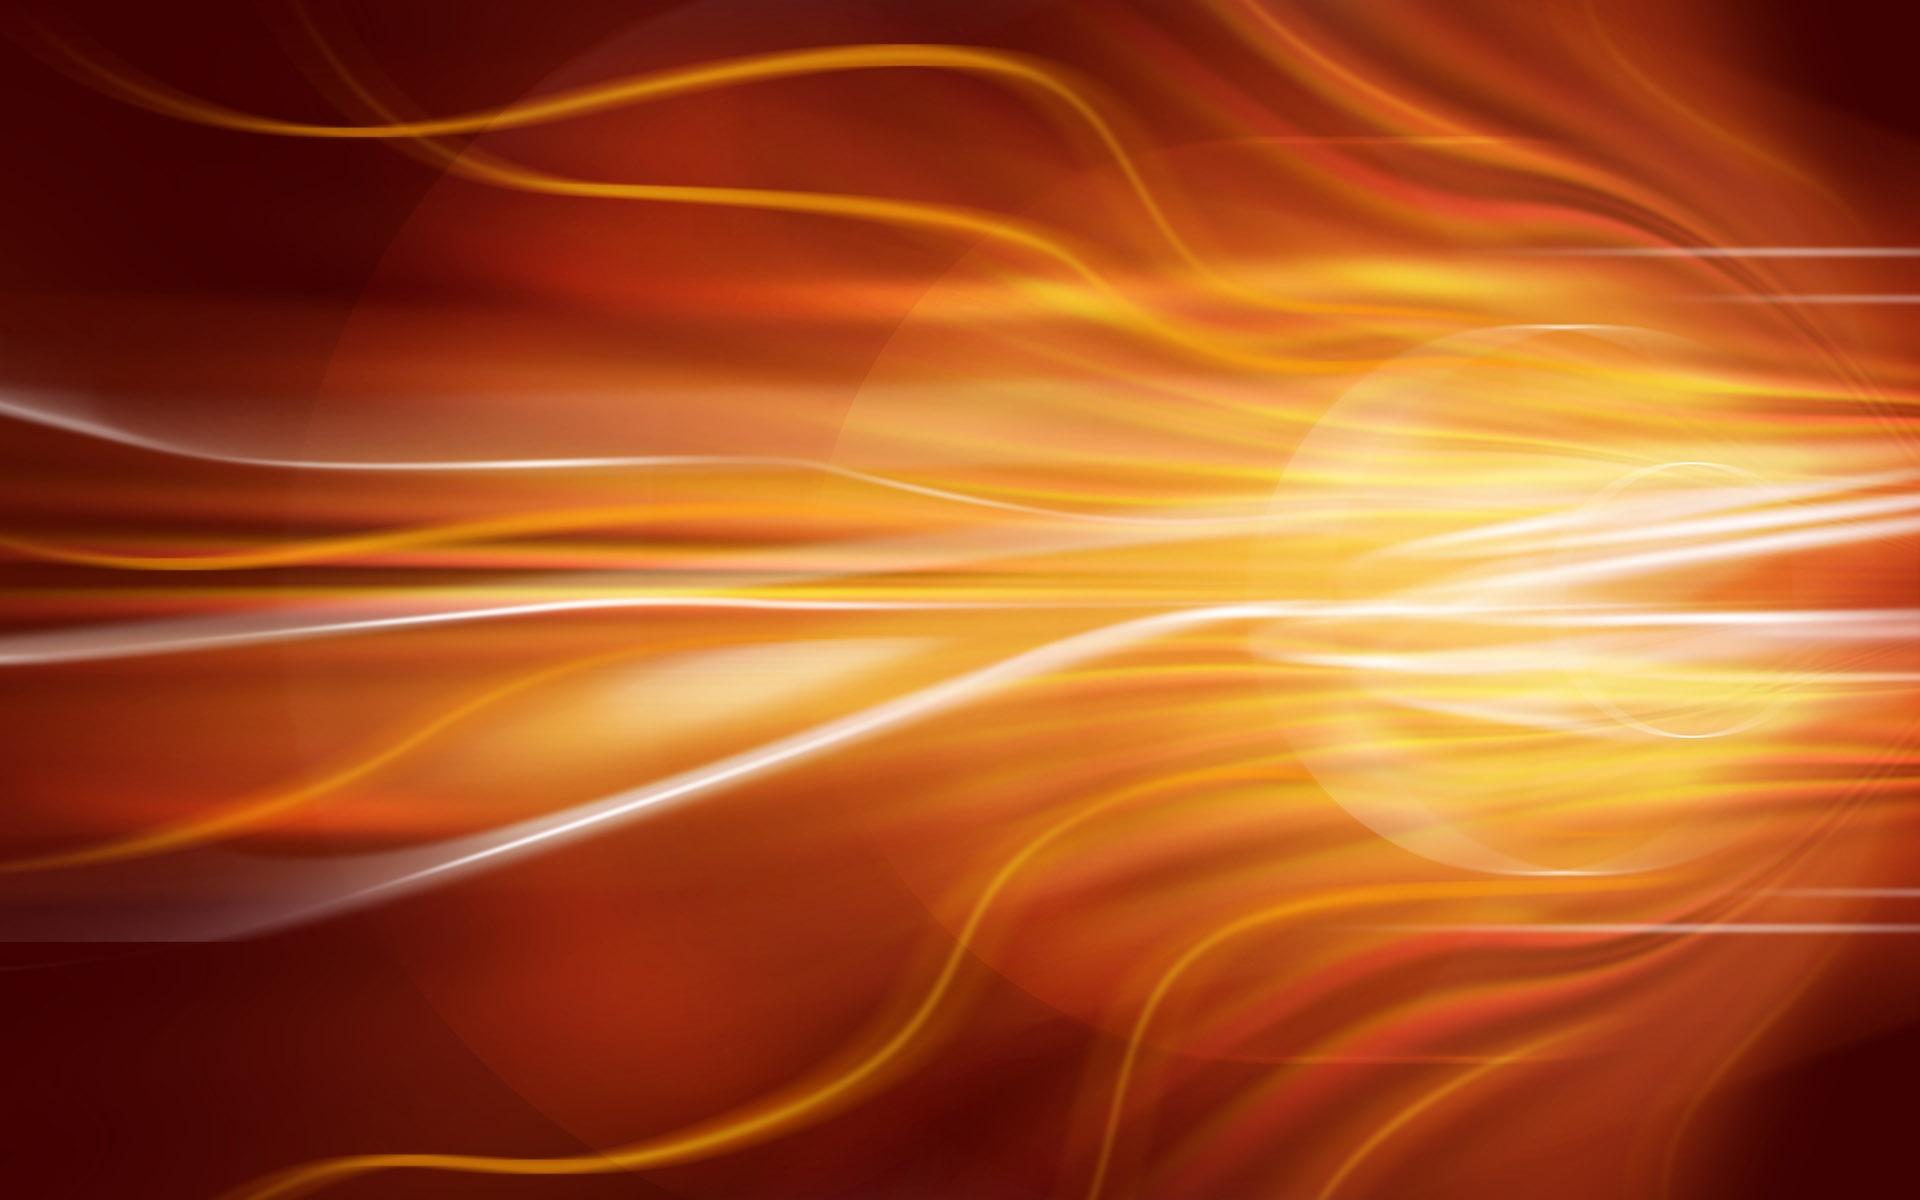 Sun Flames   Cool Twitter Backgrounds 1920x1200